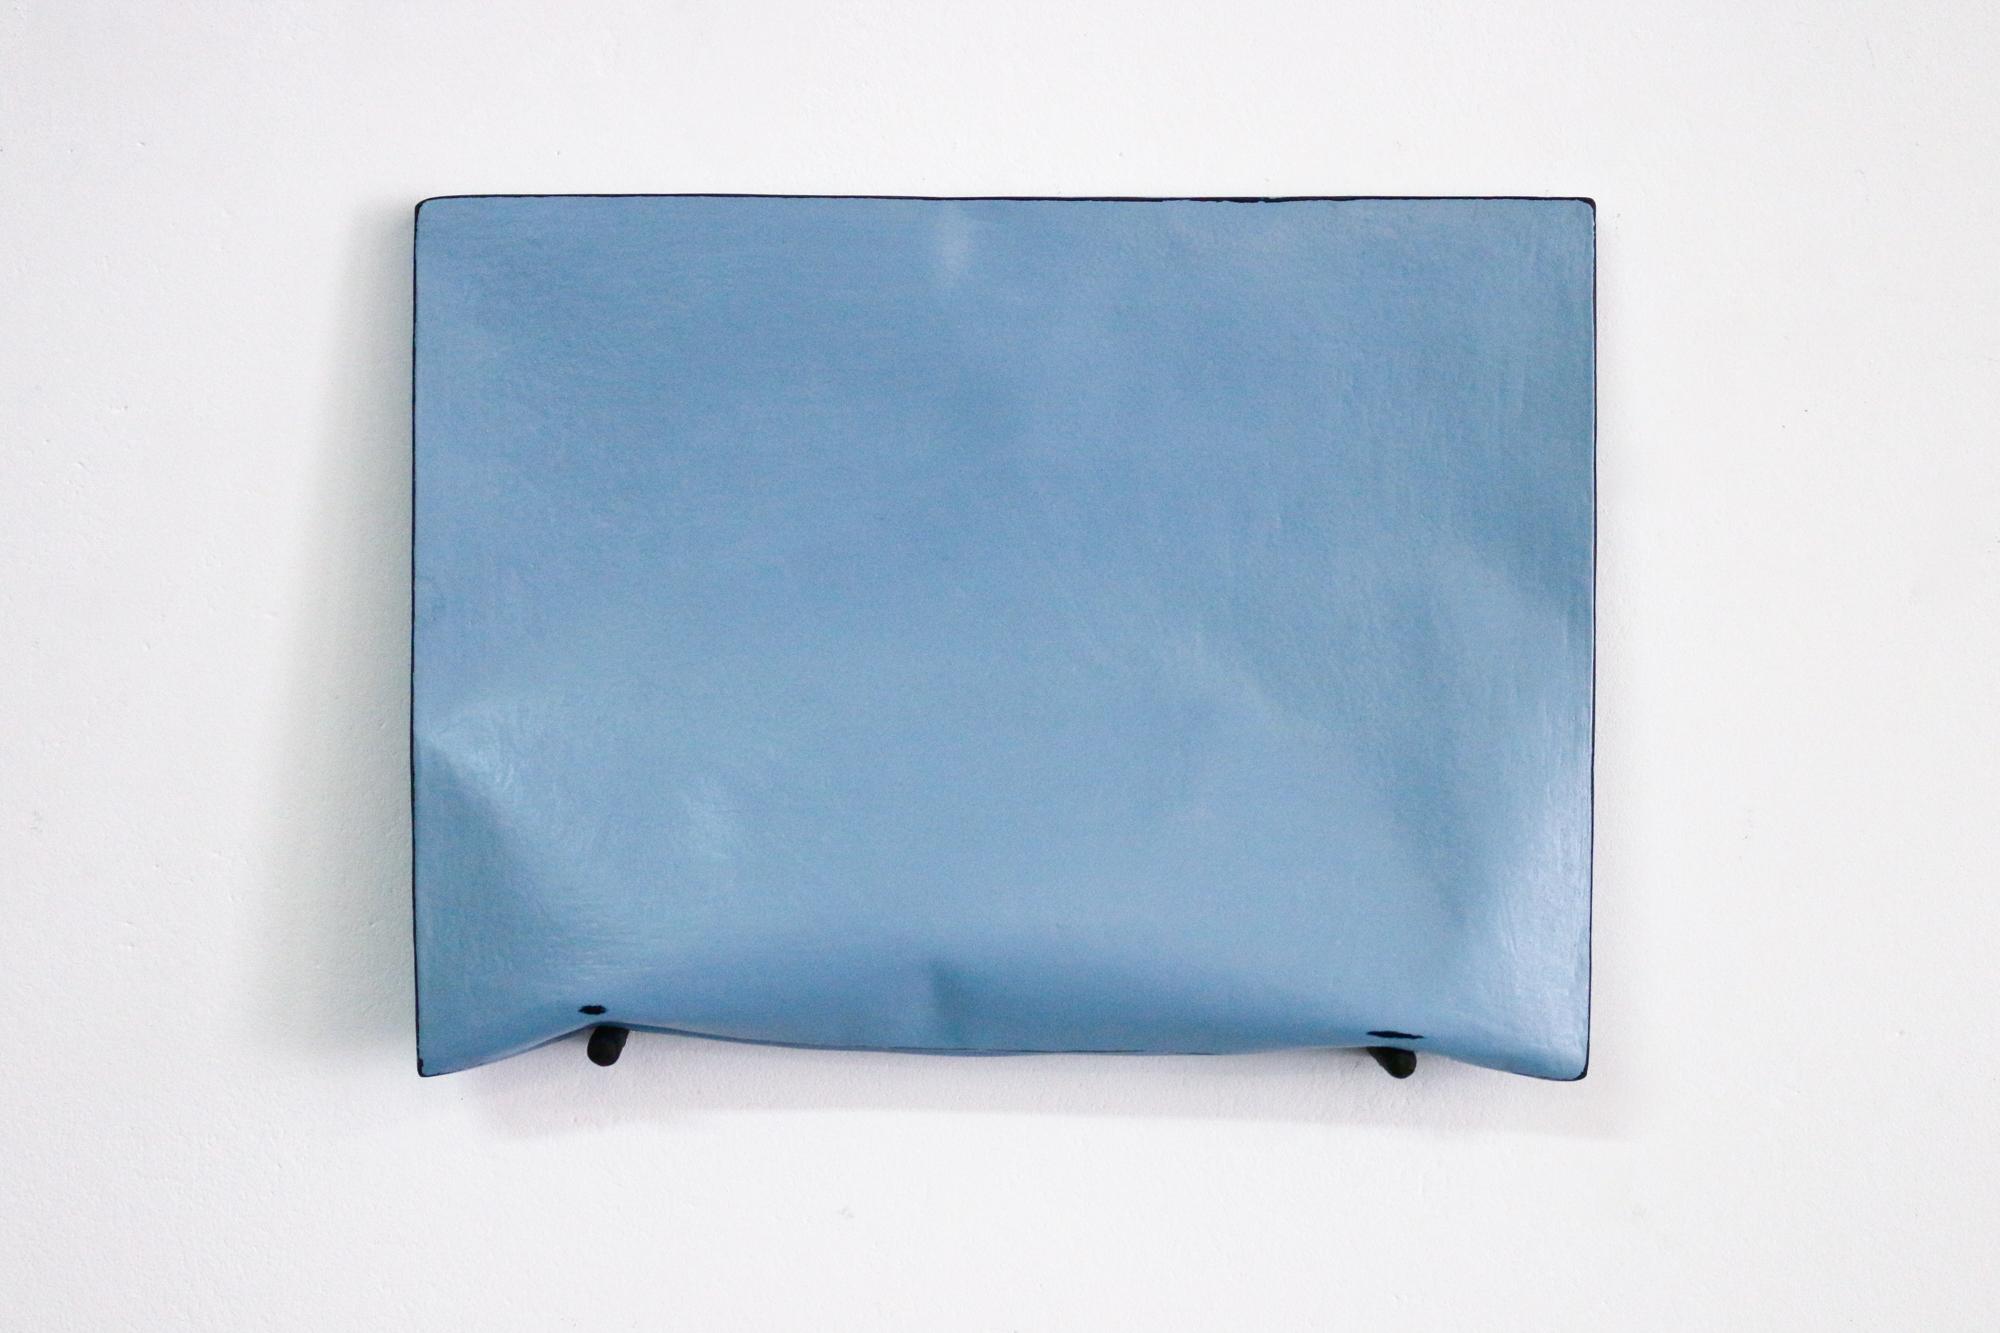 Johan De Wit, Untitled, 2018, Paper, Resin, Marble, Acrylic, 31.5 x 23.5 x 5 cm, Affinity Art